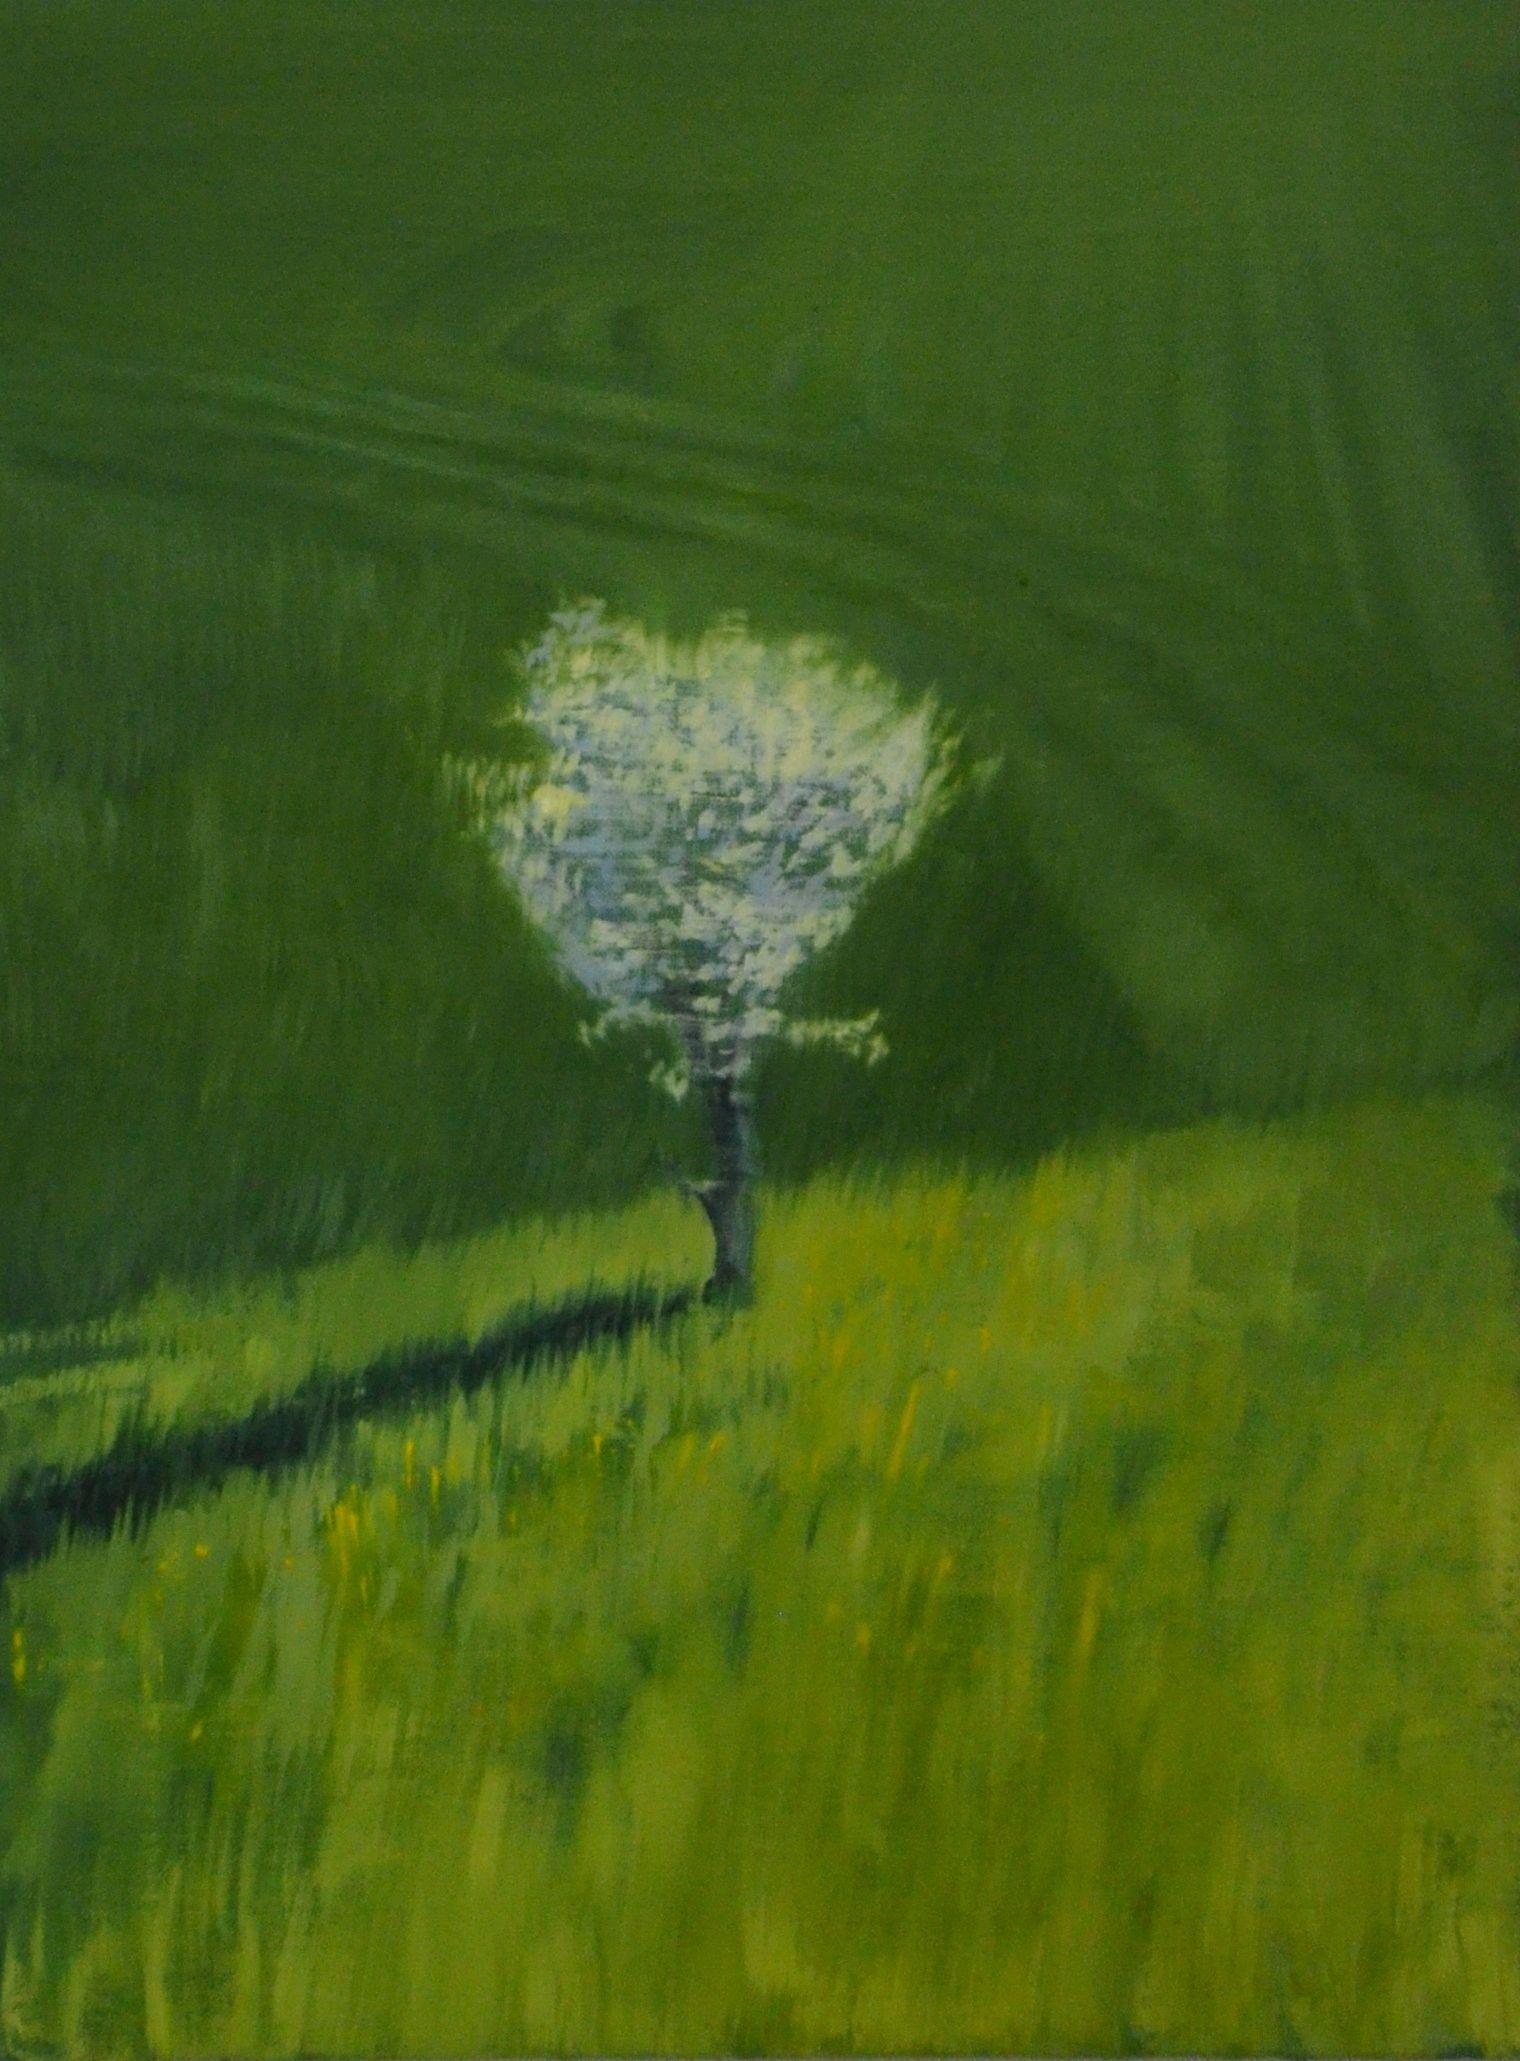 Three days of blossom,  (2014), Stefan John Orlowski